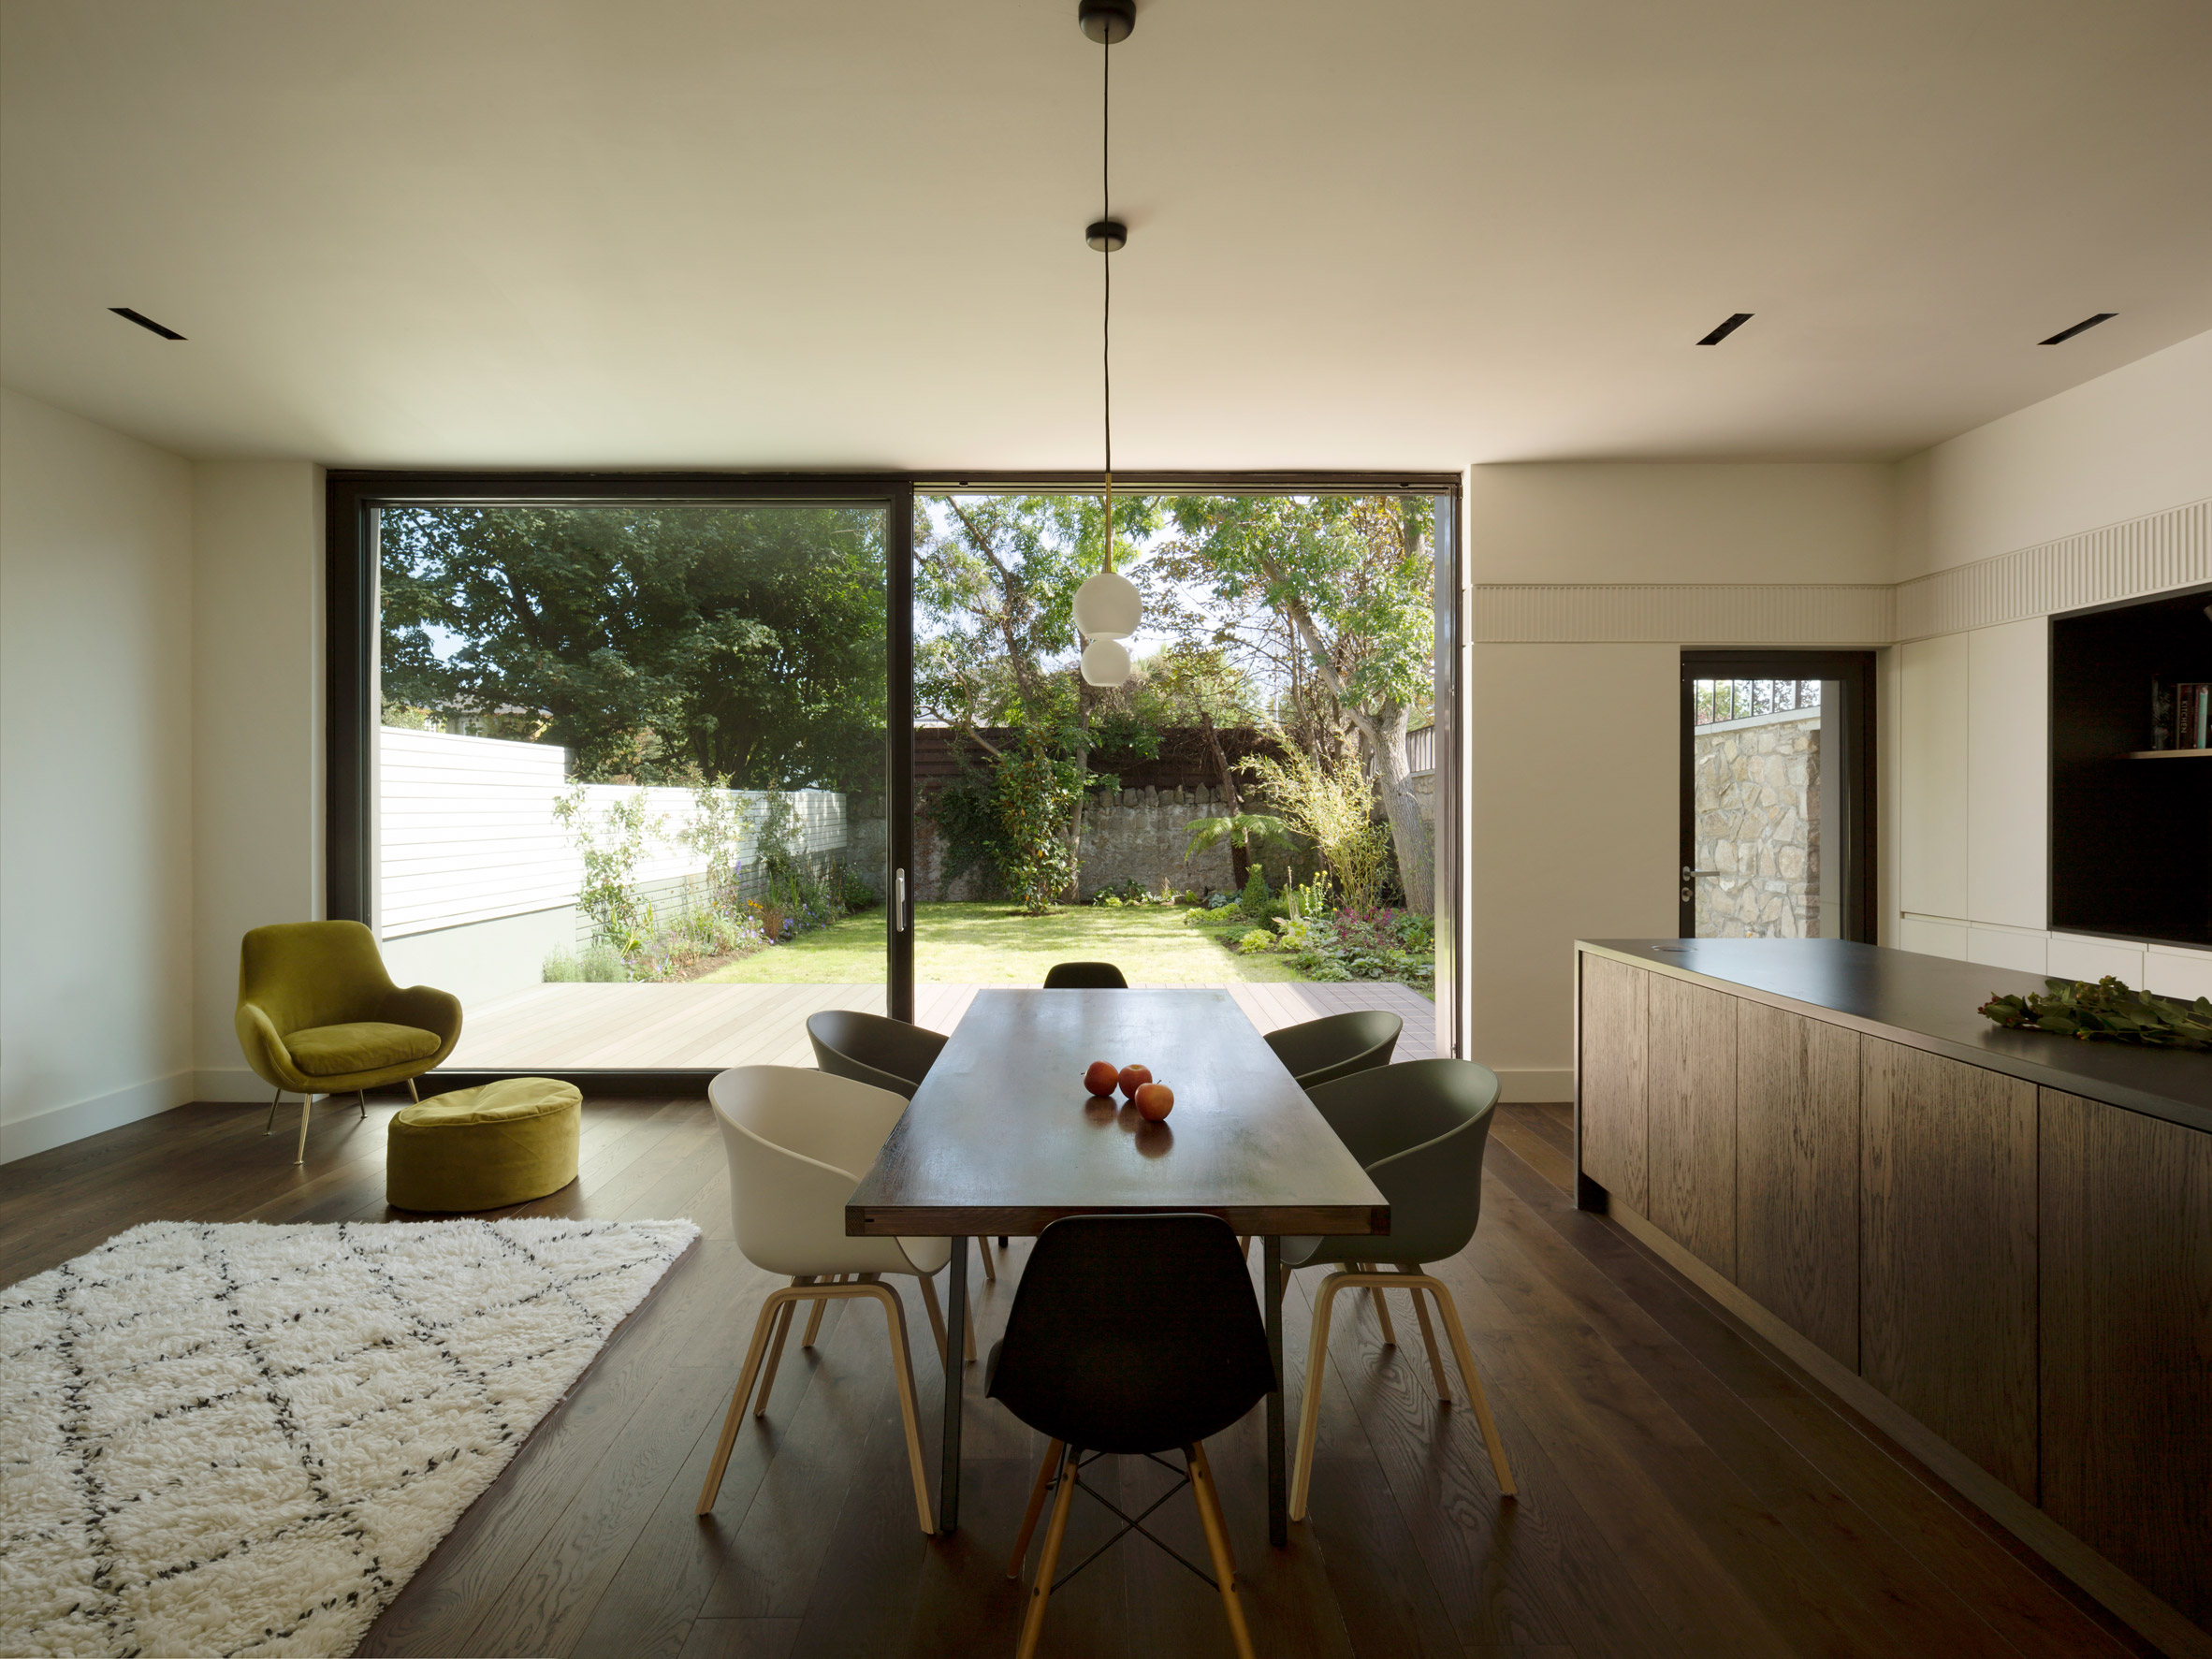 Kitchen of Corner House by Studio 304